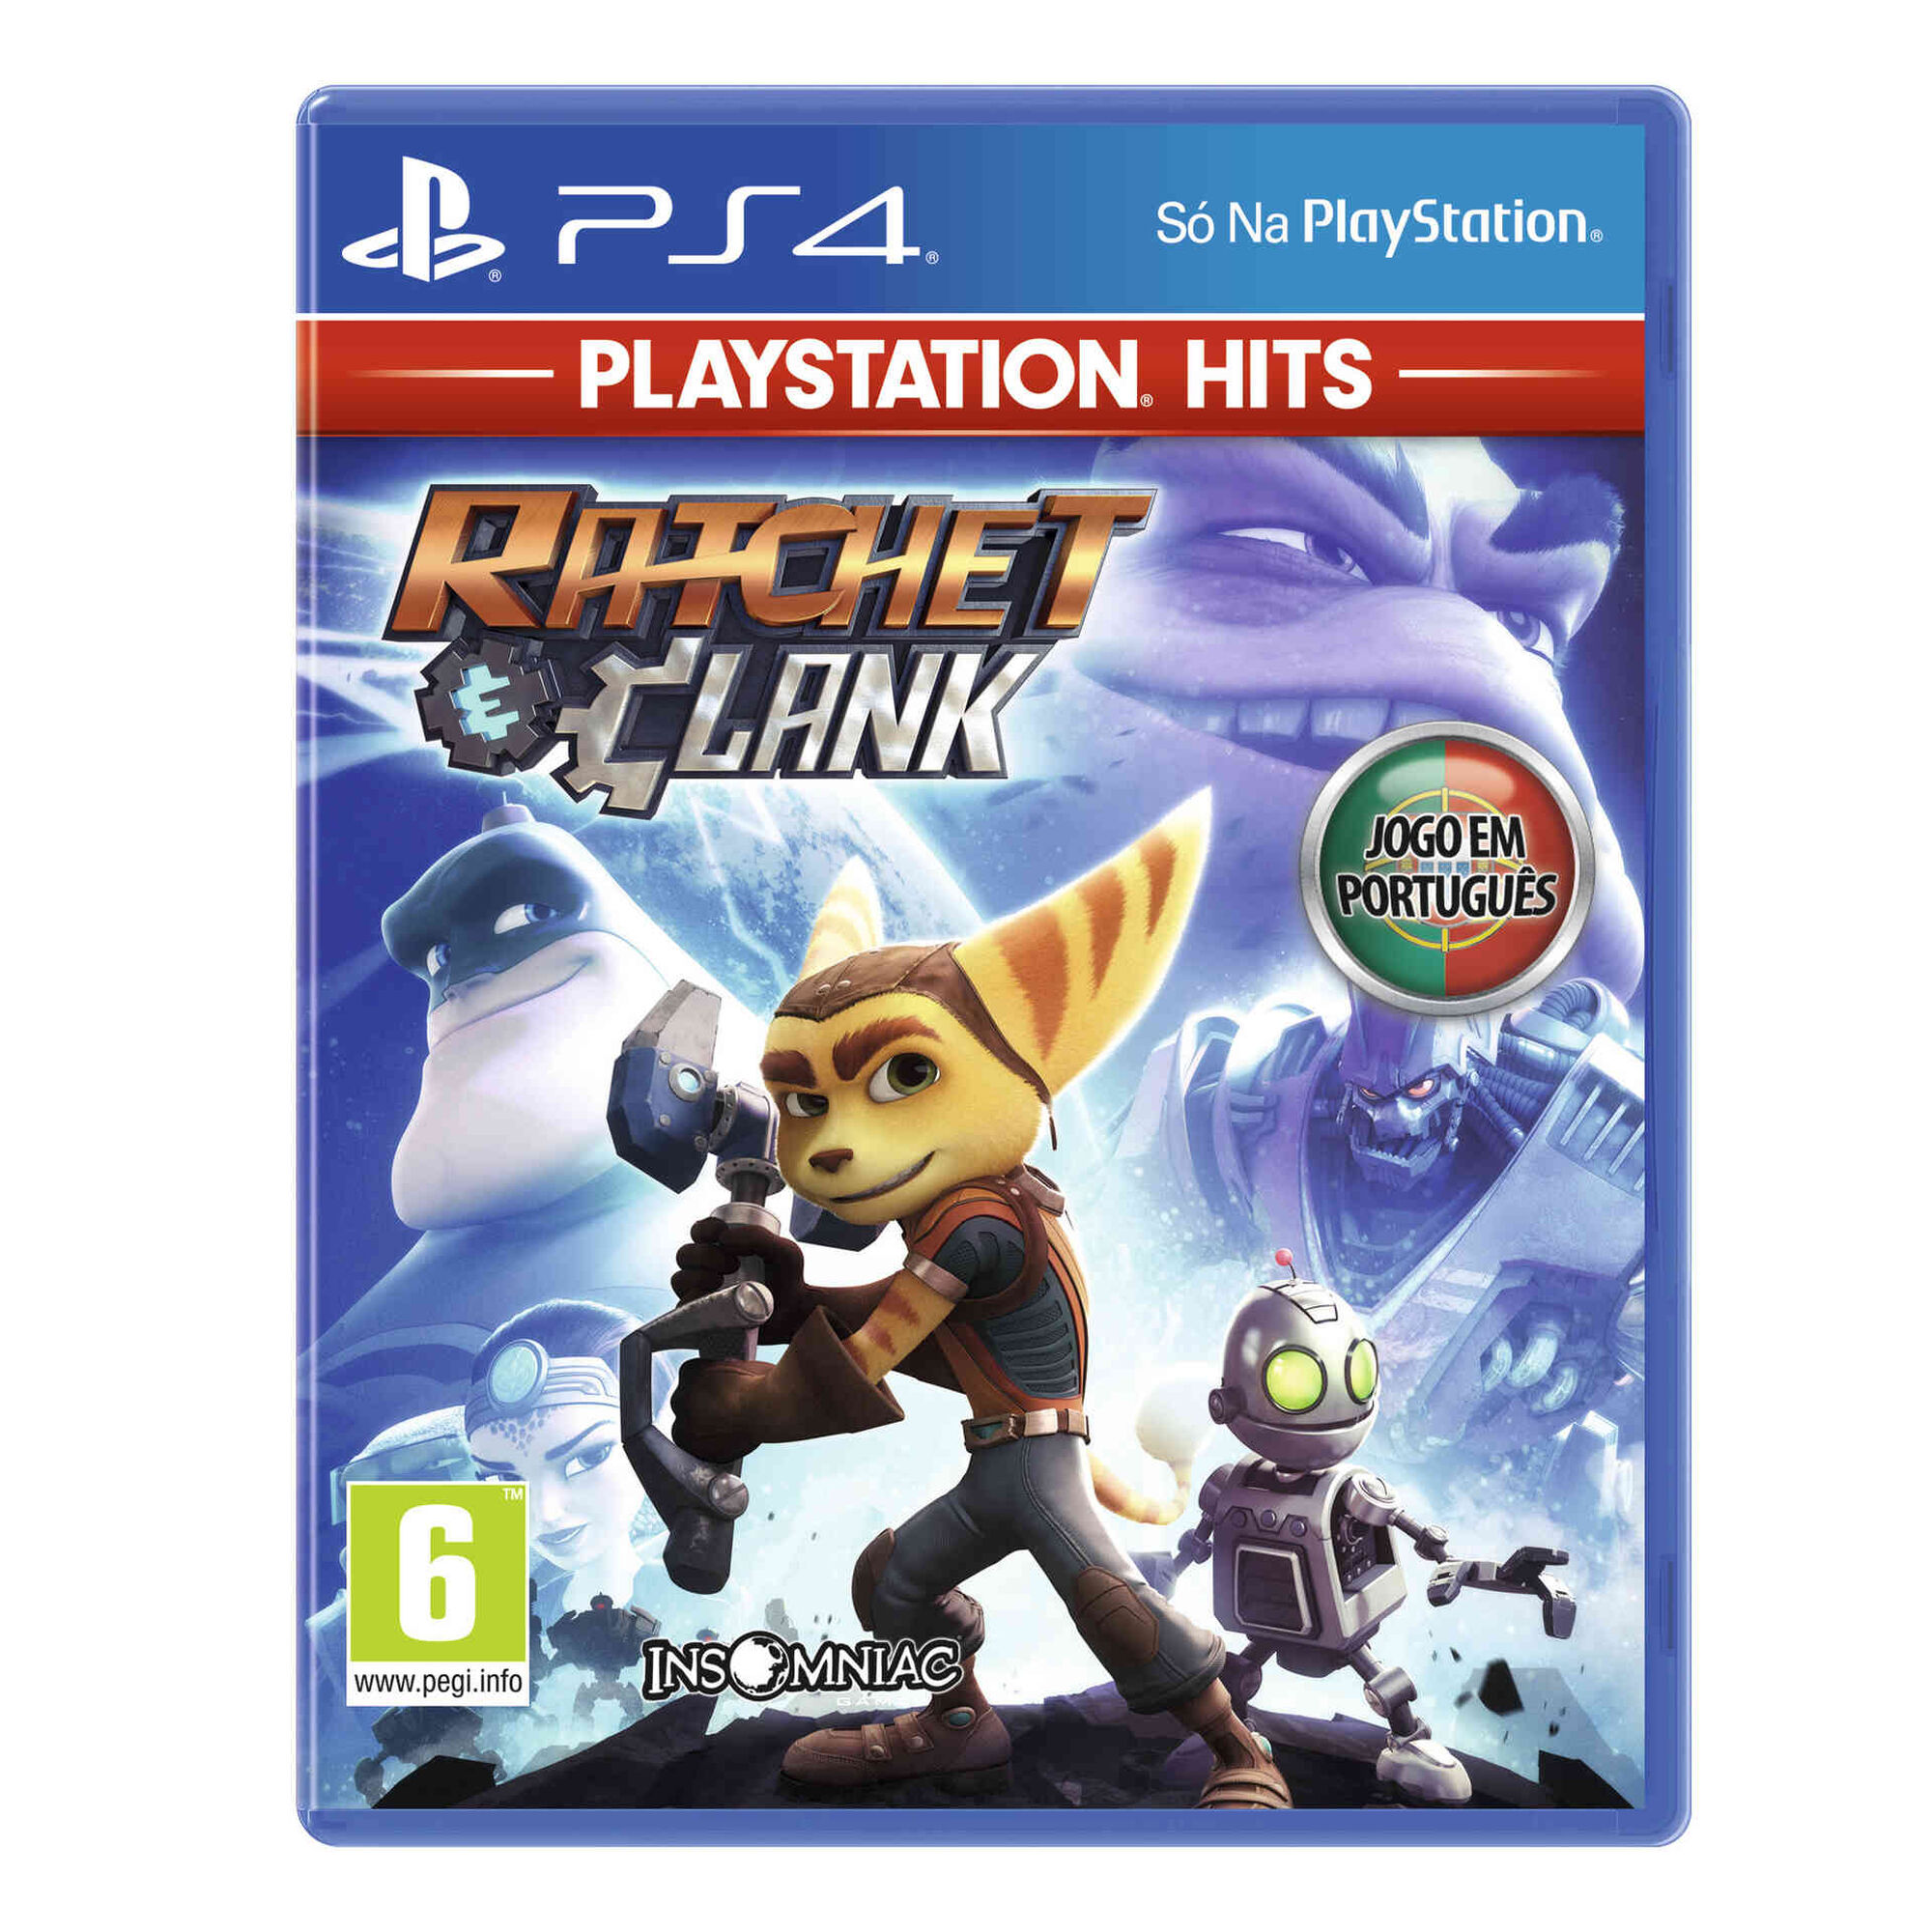 Jogo Sony PS4 Ratchet & Clank Hits